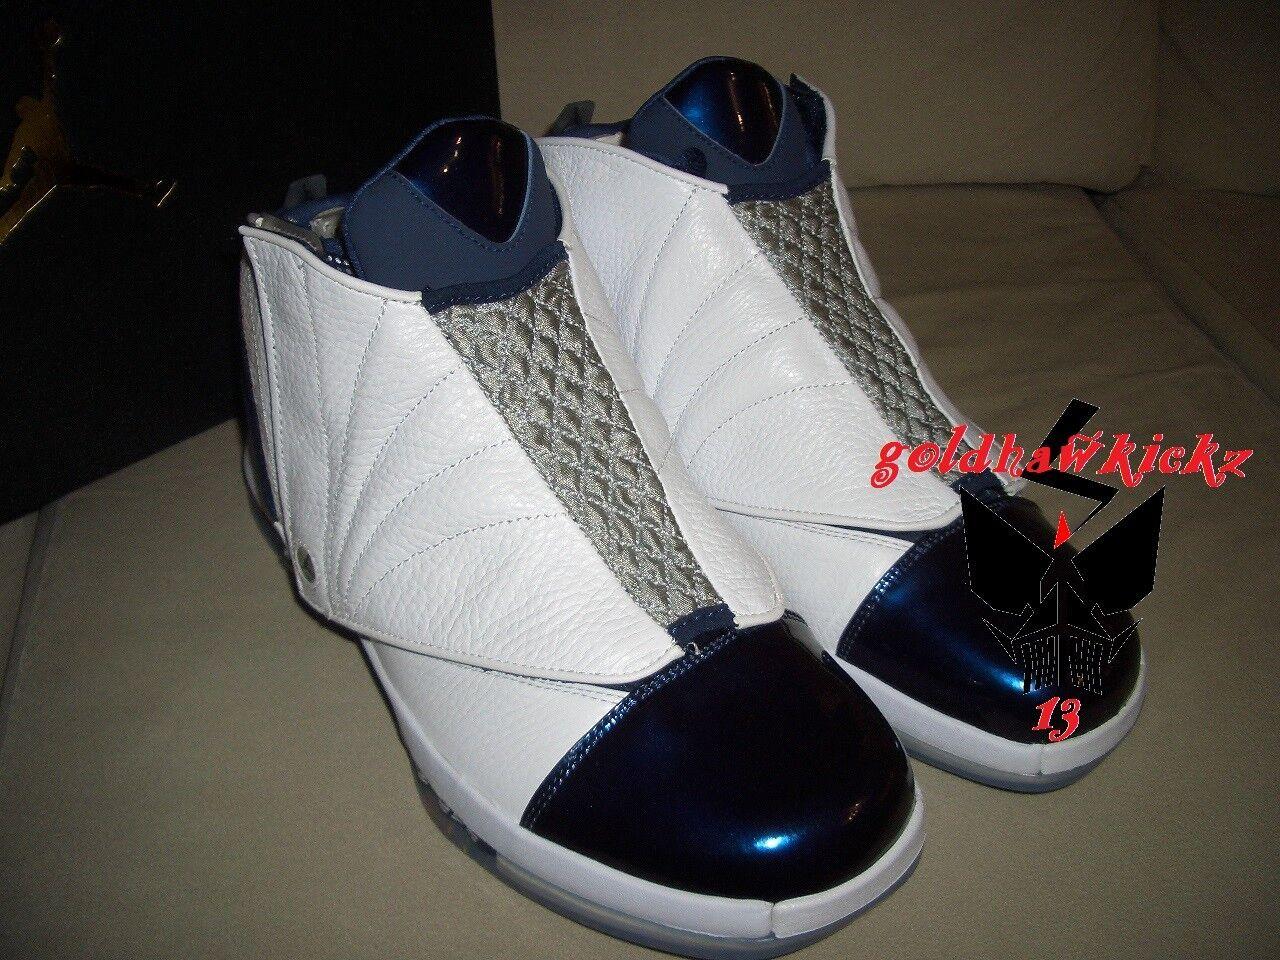 Nike air jordan, xvi, 16 'mezzanotte blu navy 683075 106 finley ray allen